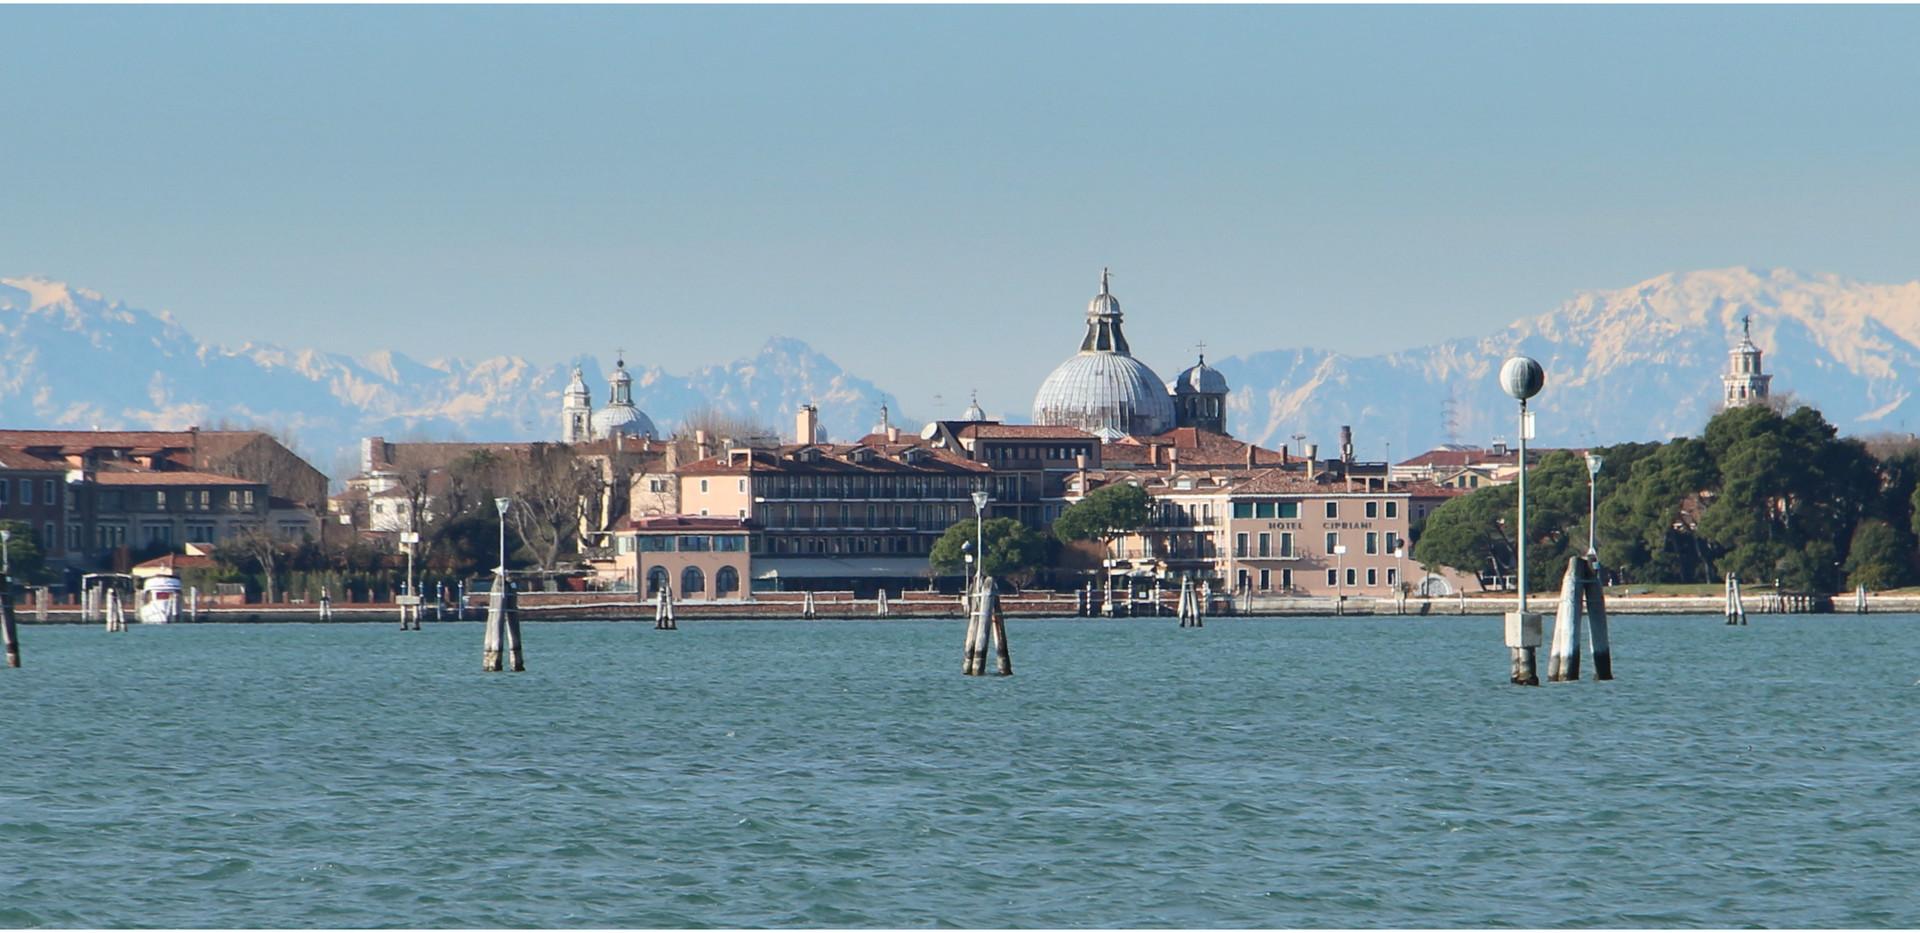 Venezia under Dolomiti Alexandre Cosentino